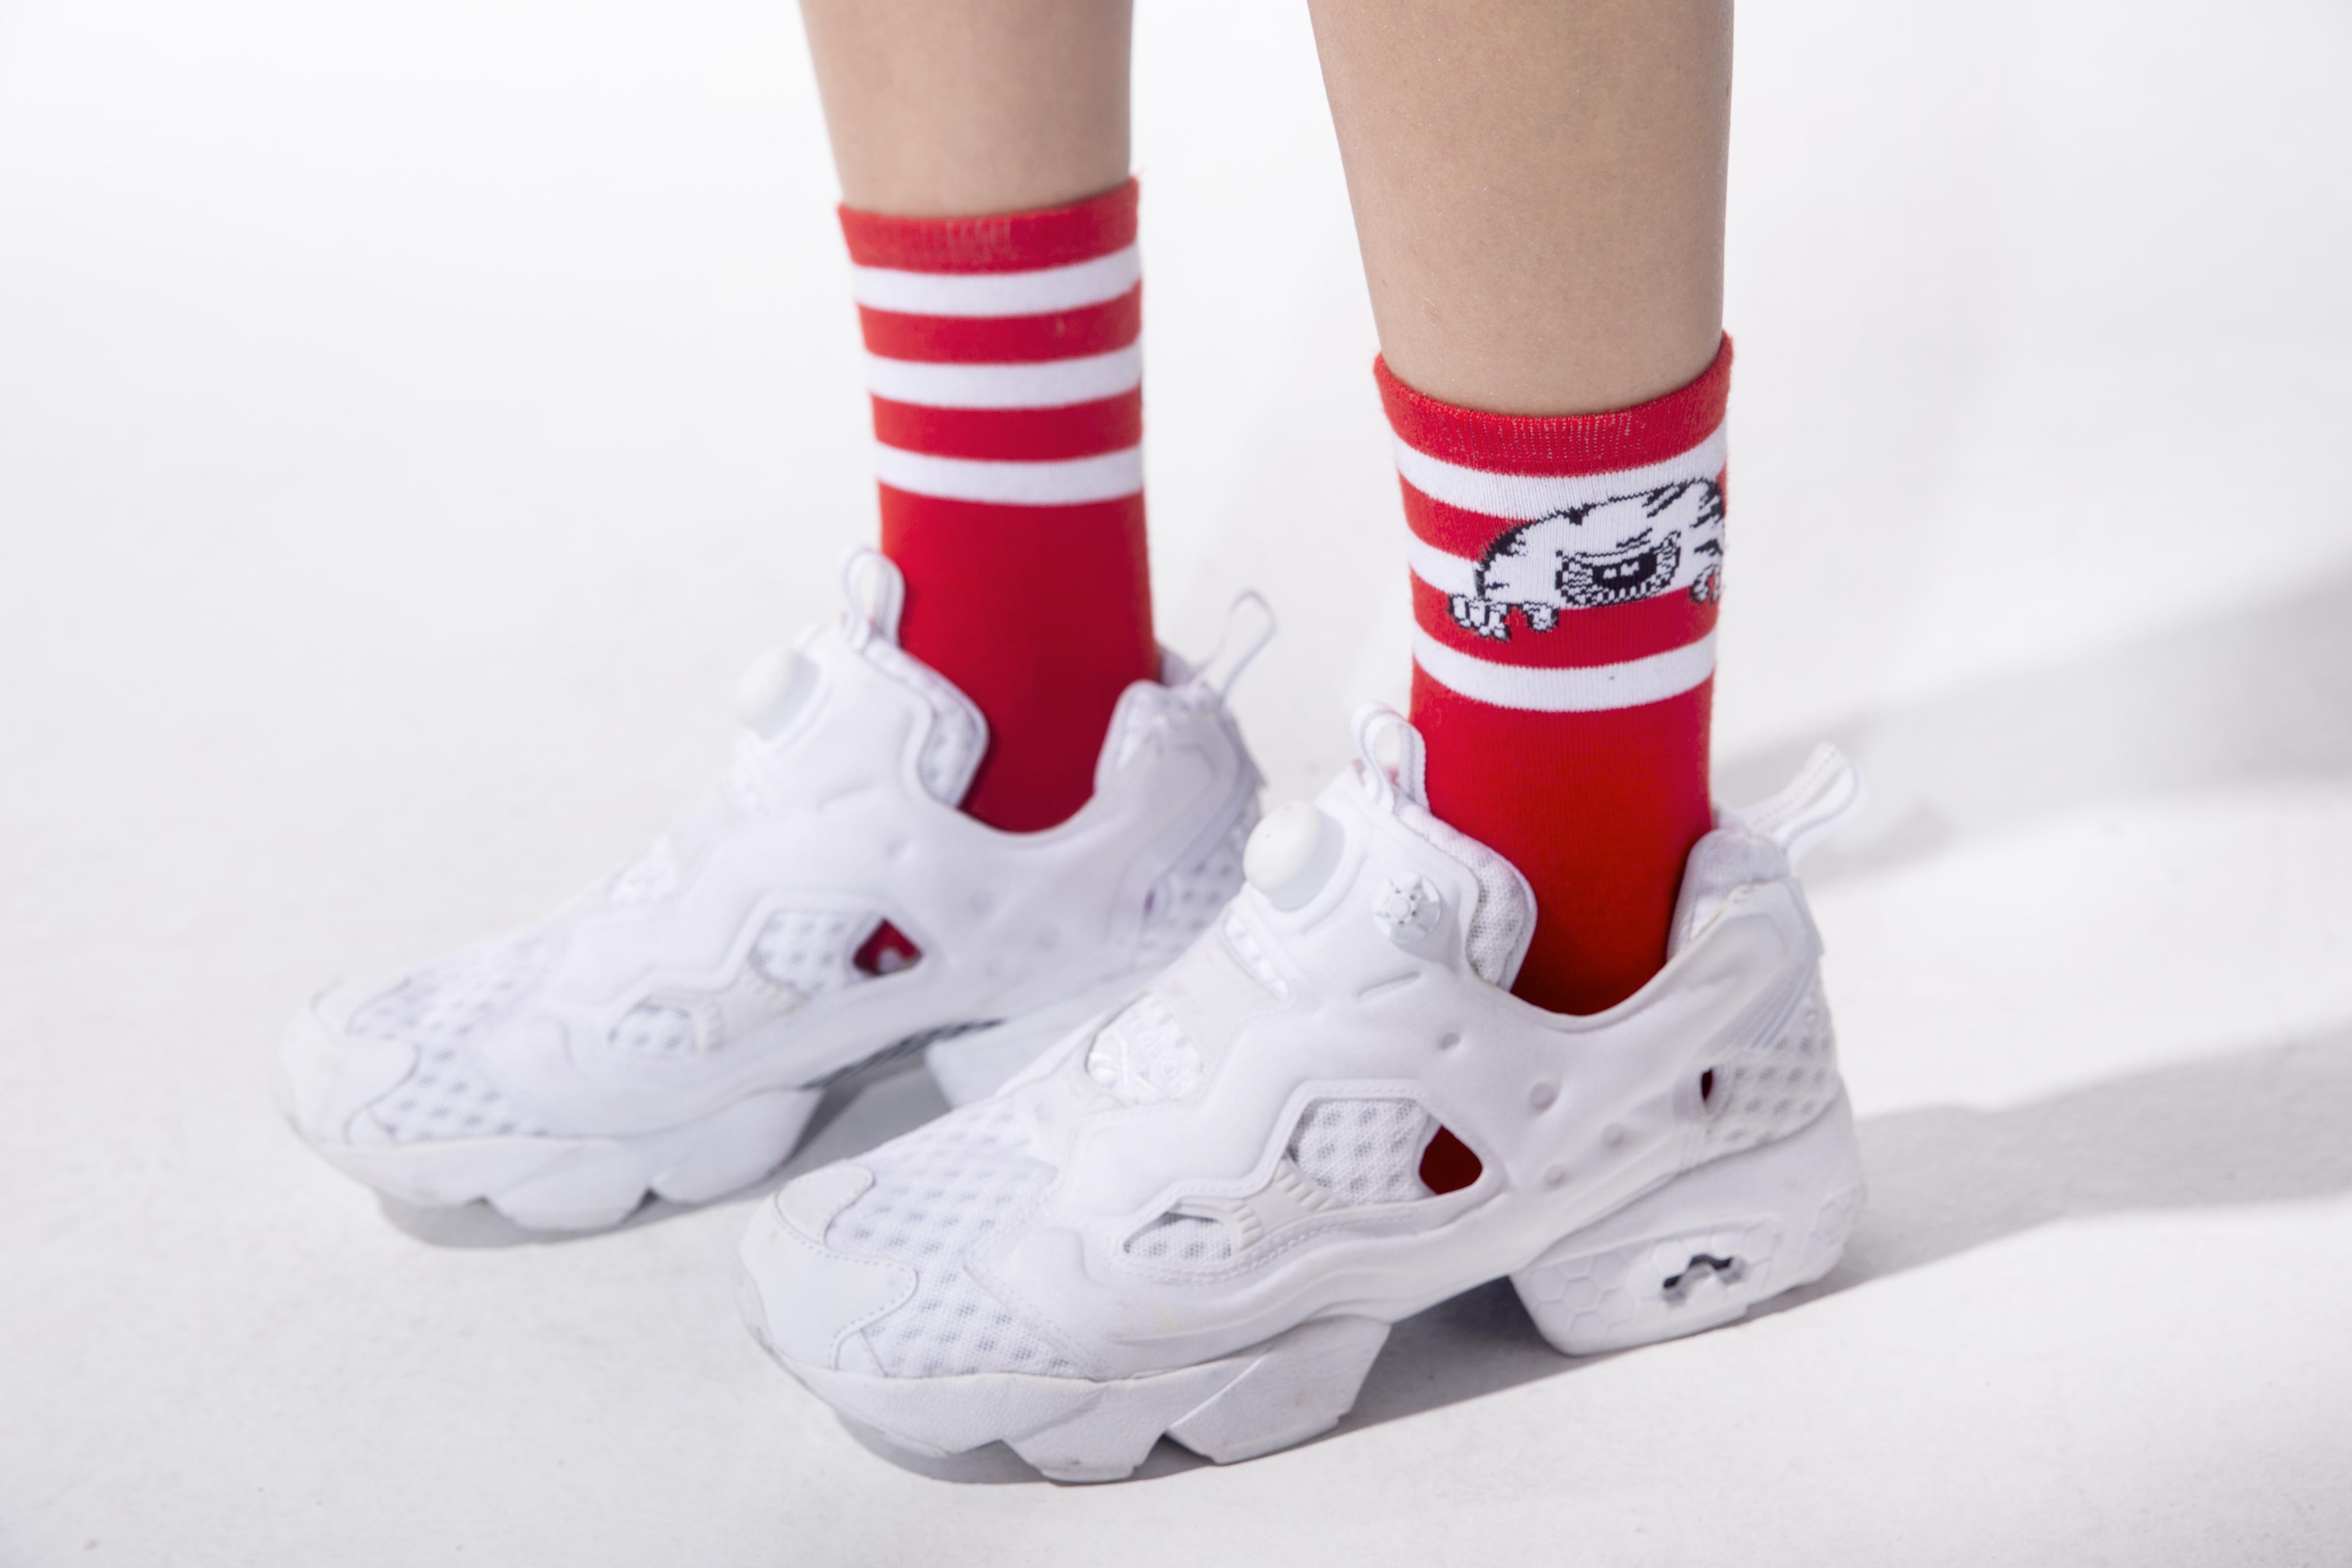 Peek-A-Boo Keep Watch Socks